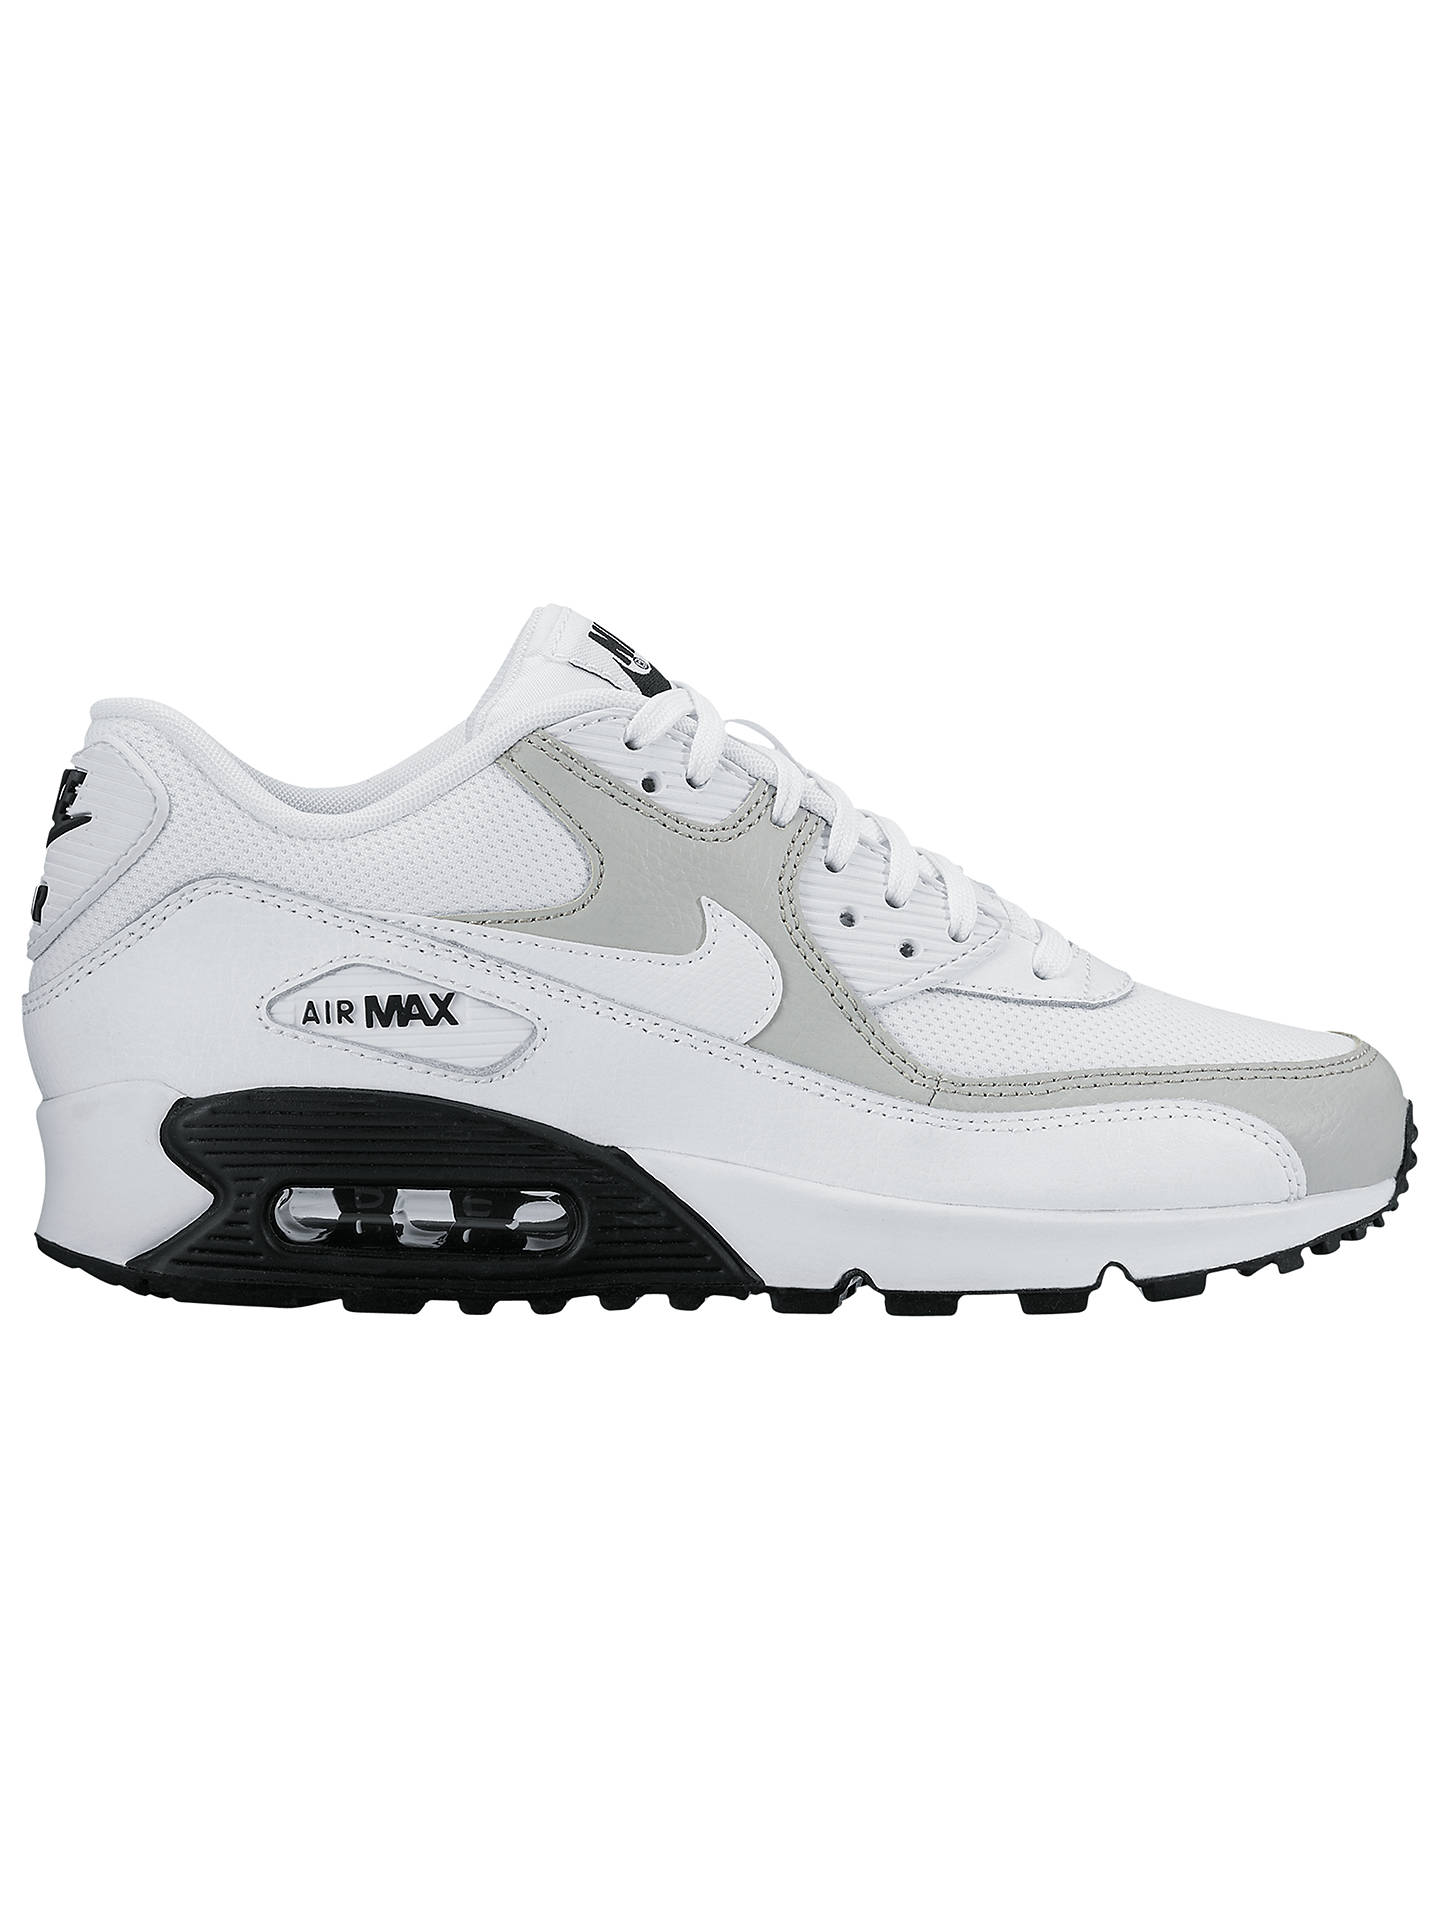 wholesale dealer 5650c e72ec Nike Air Max 90 Women's Trainers, White/Wolf Grey at John ...